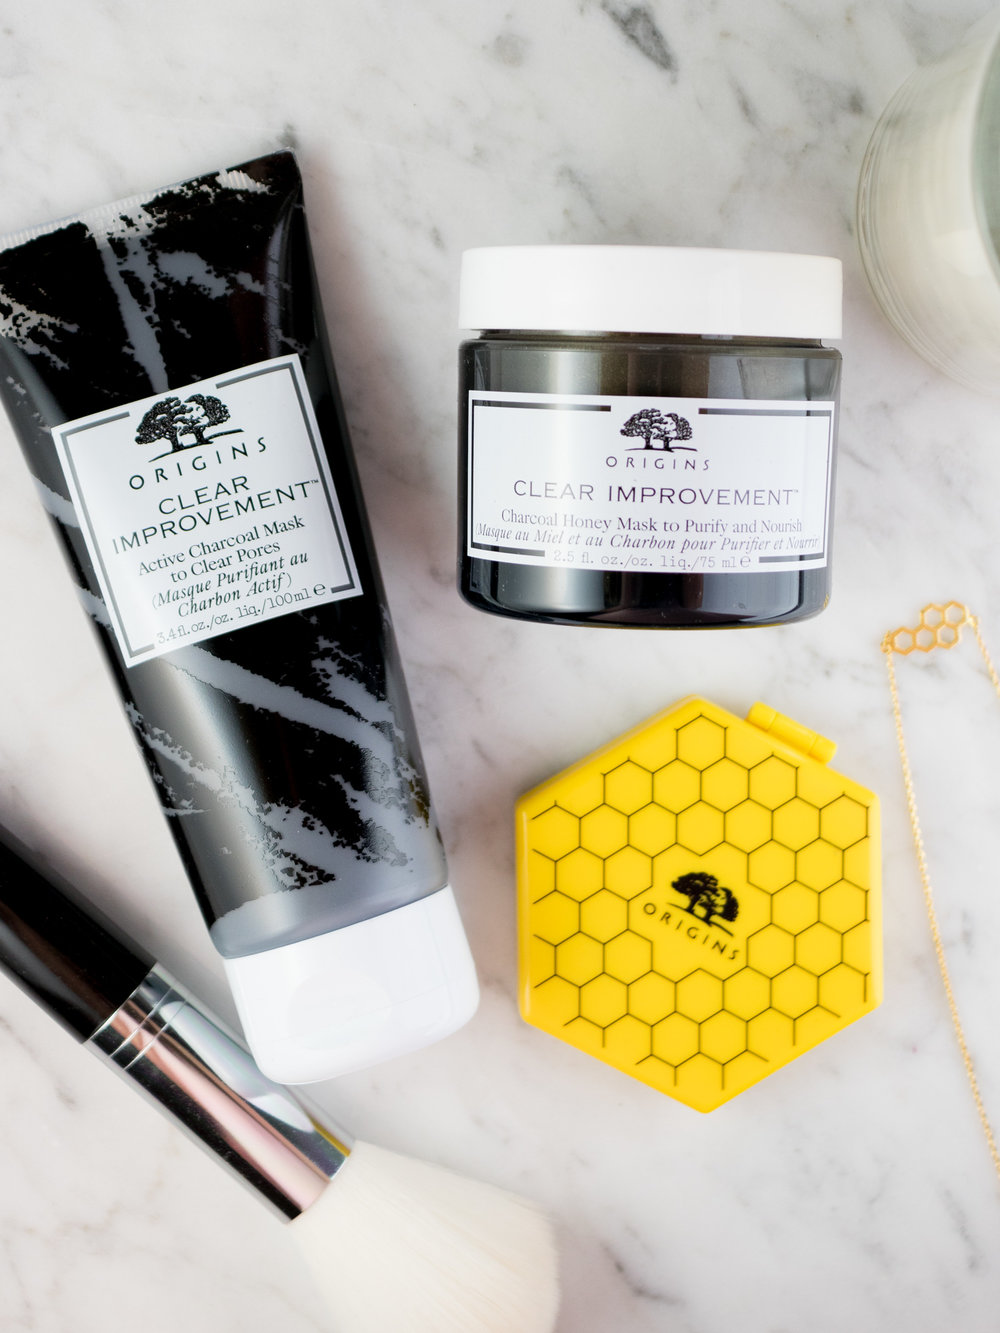 Origins Clear Improvement Charcoal Honey Mask